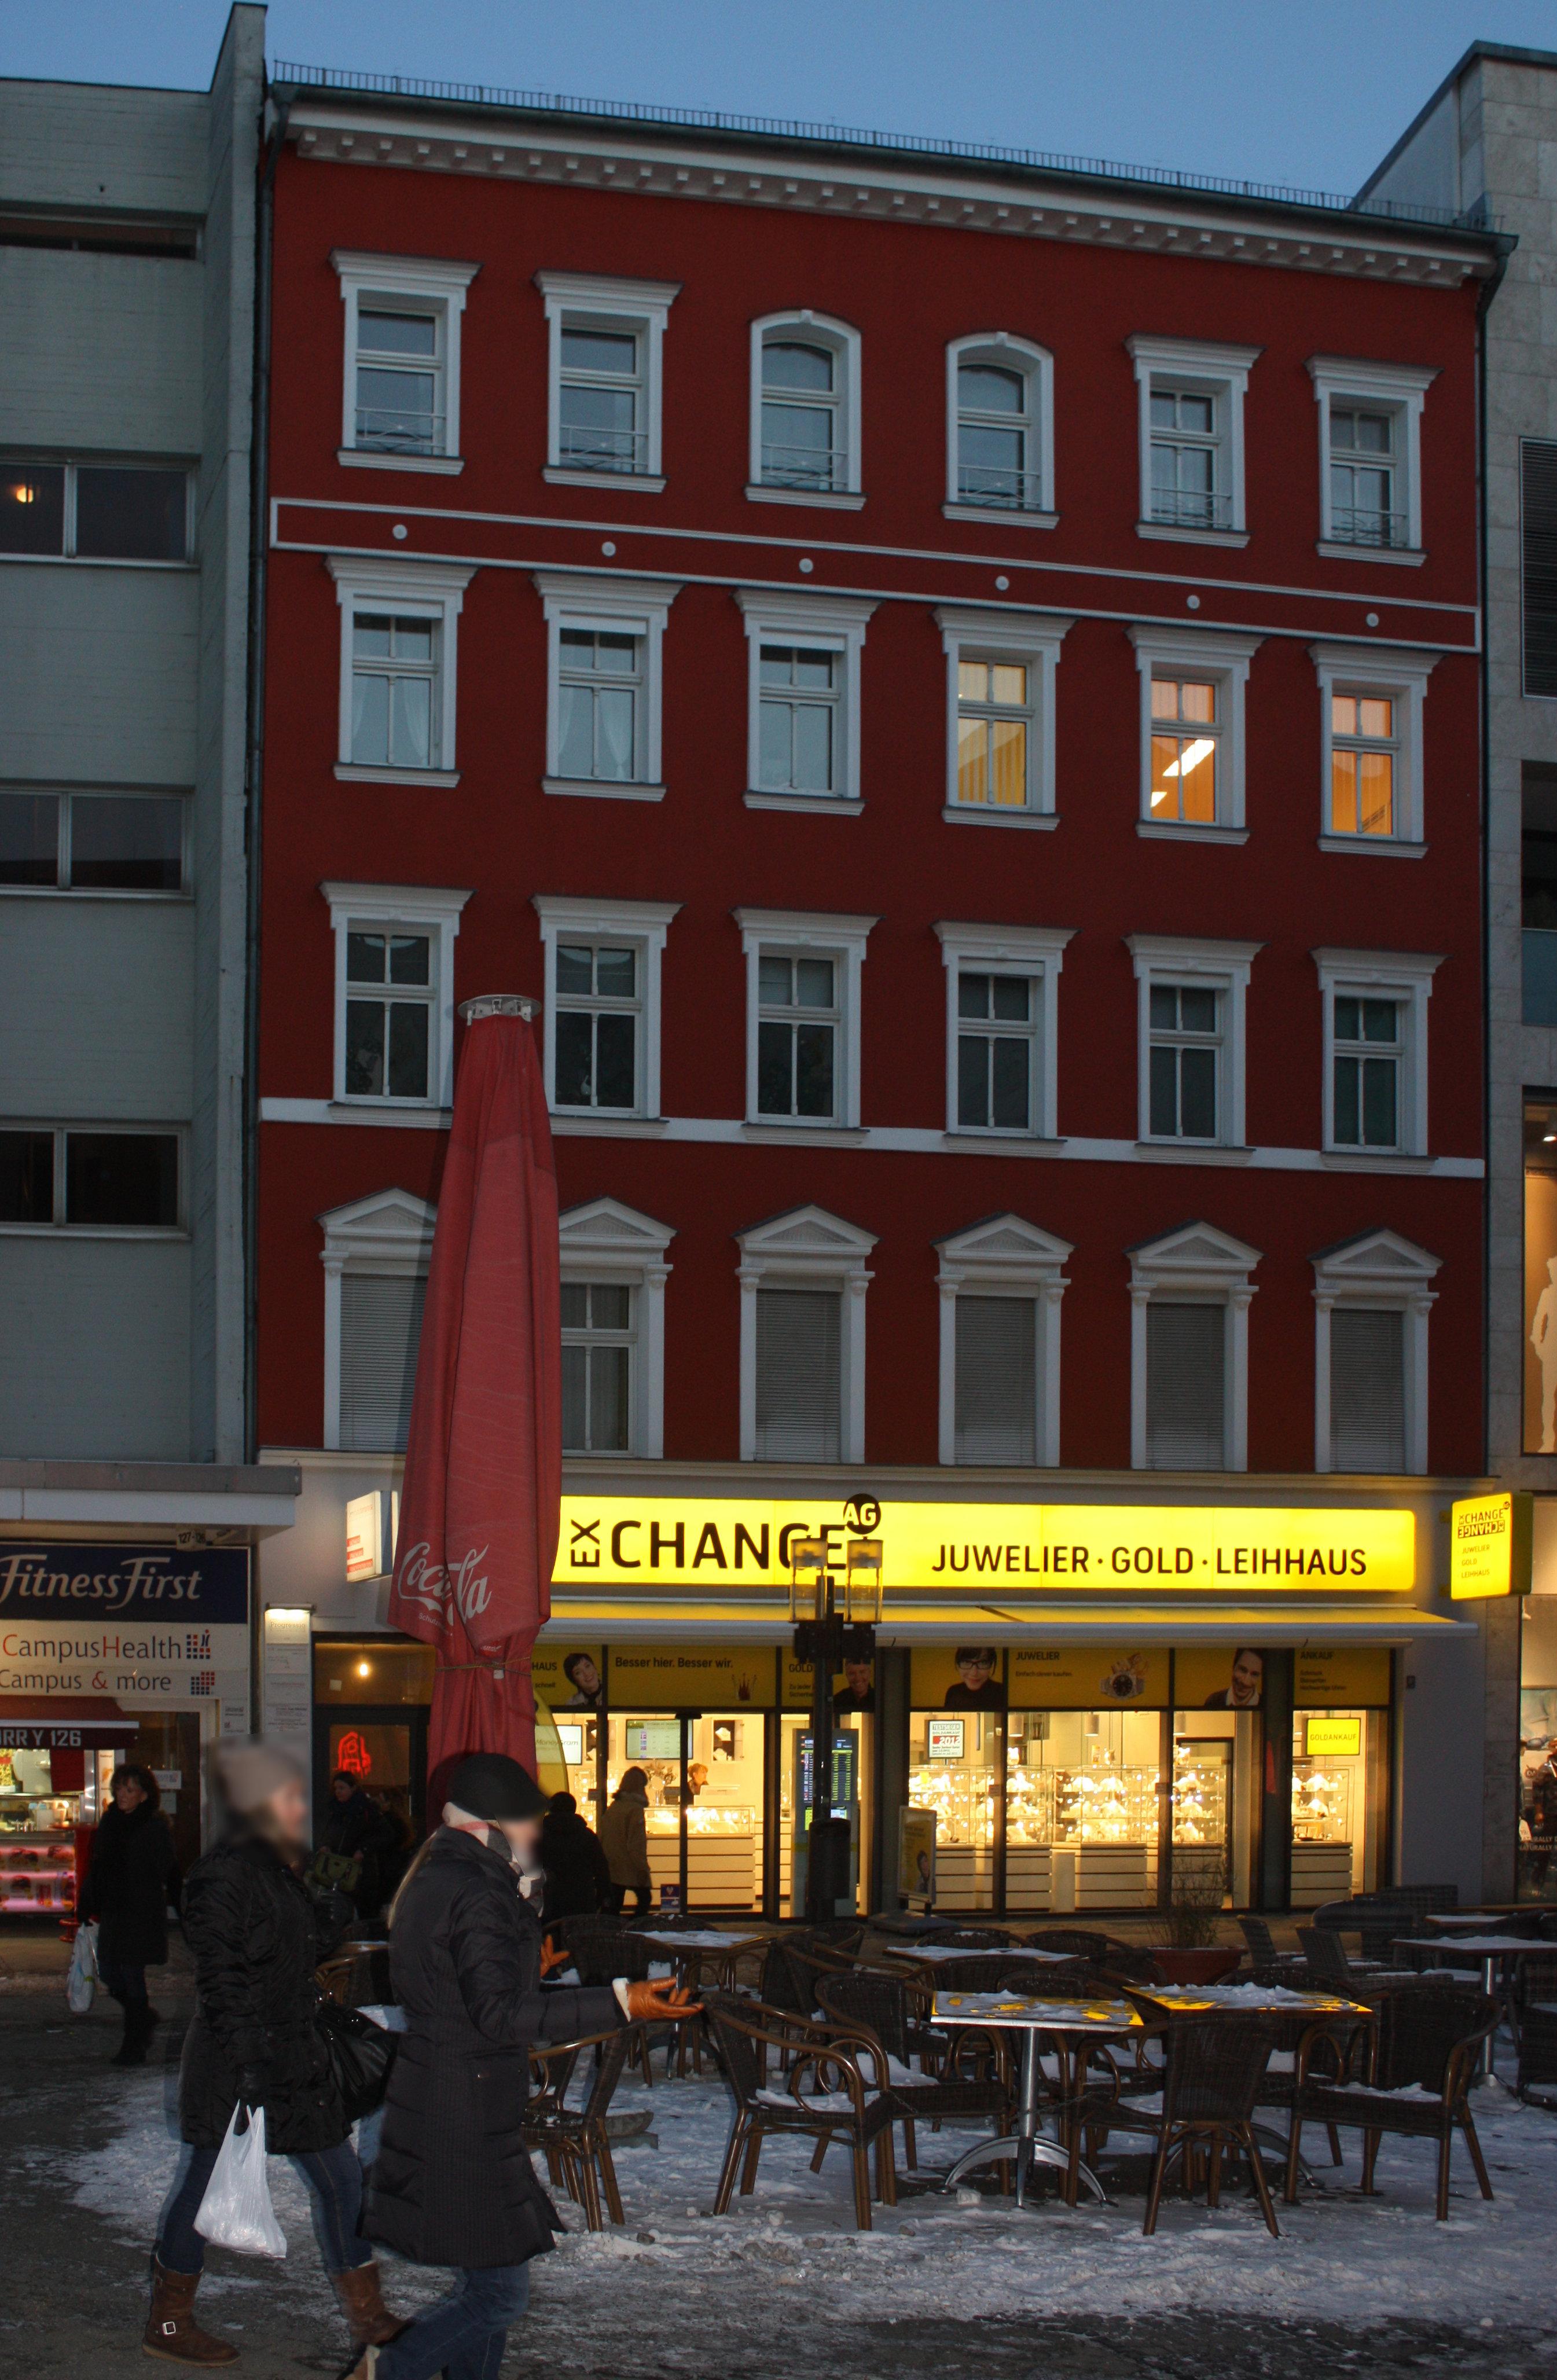 file berlin charlottenburg house 134 wilmersdorfer stra e jpg wikimedia commons. Black Bedroom Furniture Sets. Home Design Ideas